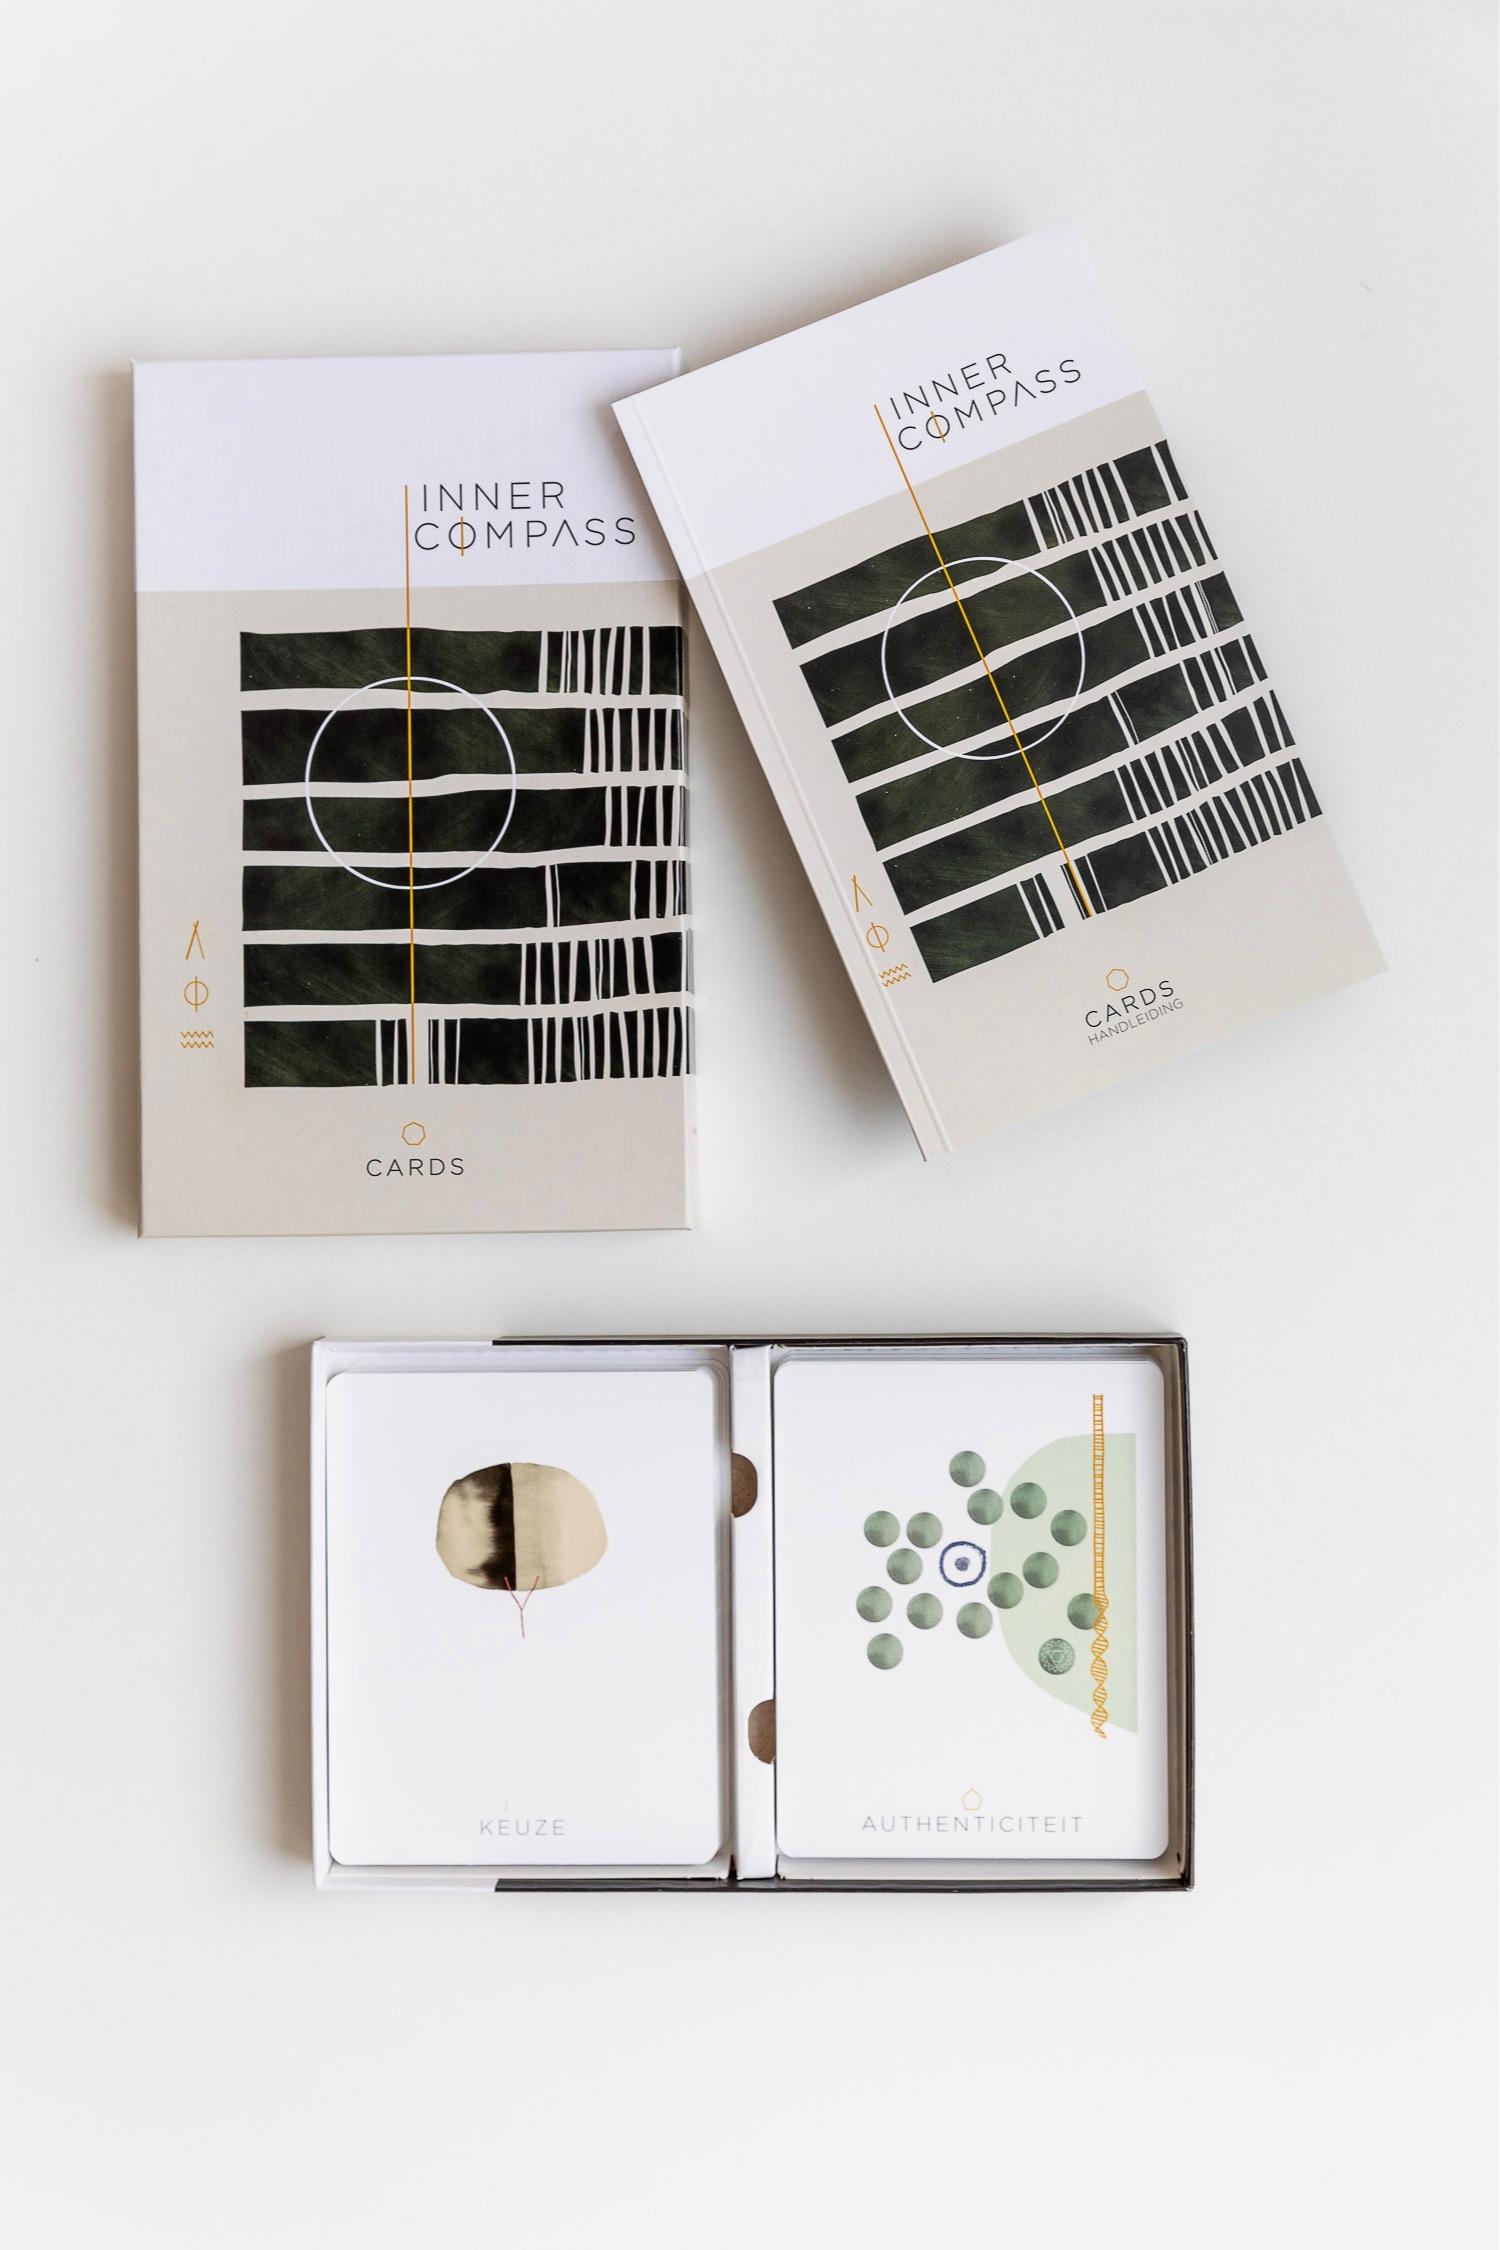 1840-verdenius-inner-compass-cards-72-dpi-143A8102.jpg